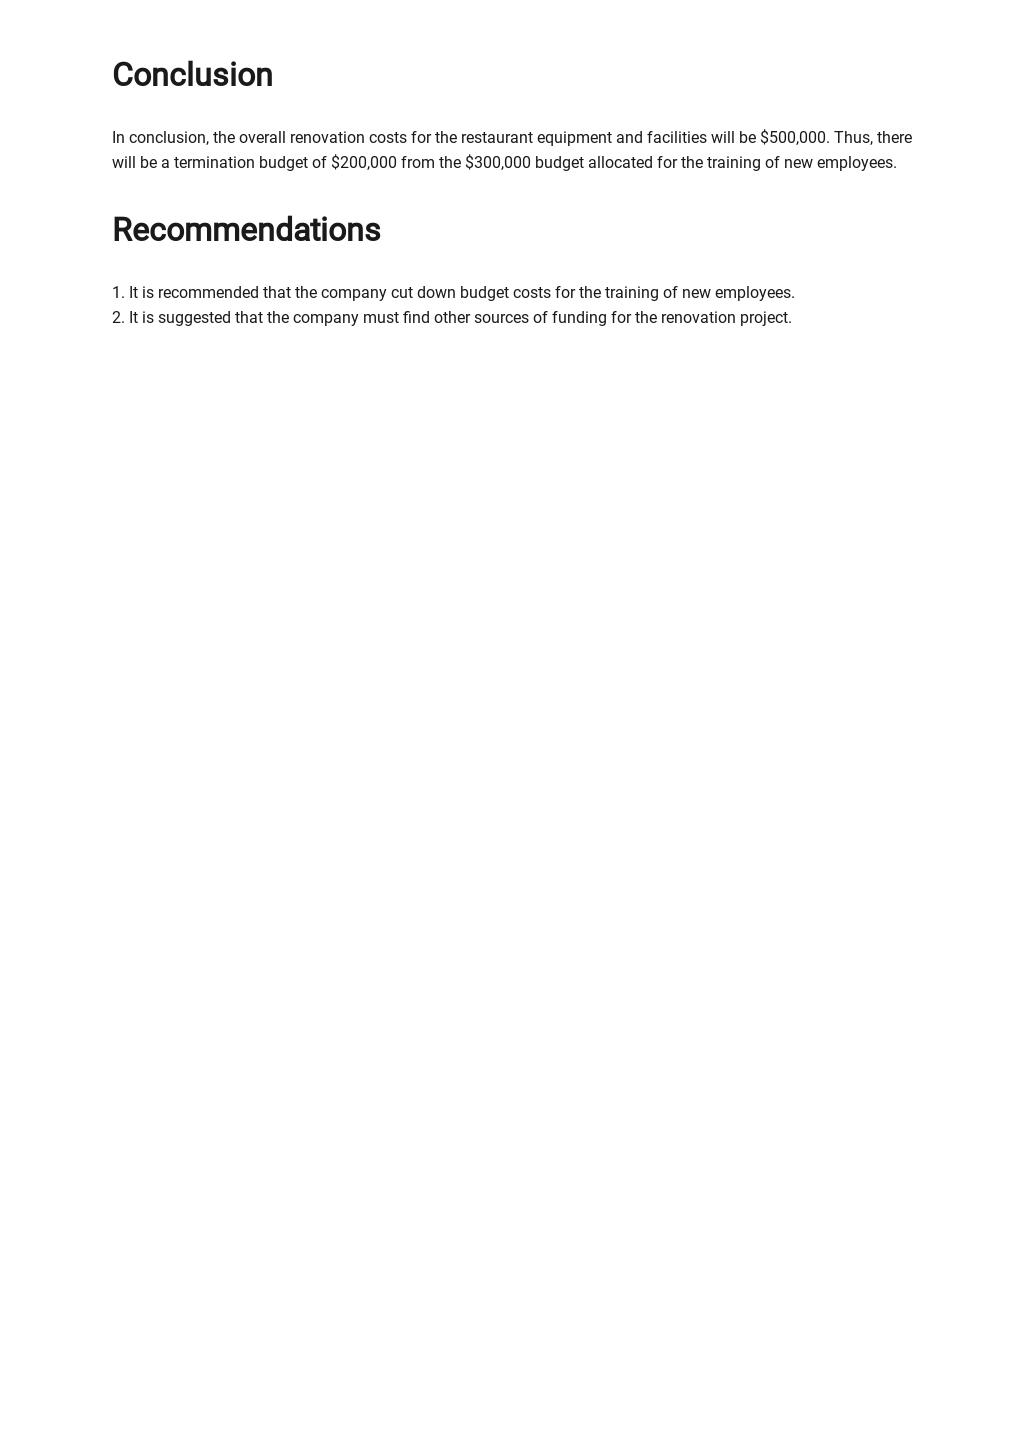 Termination Budget Analysis Report Template 4.jpe